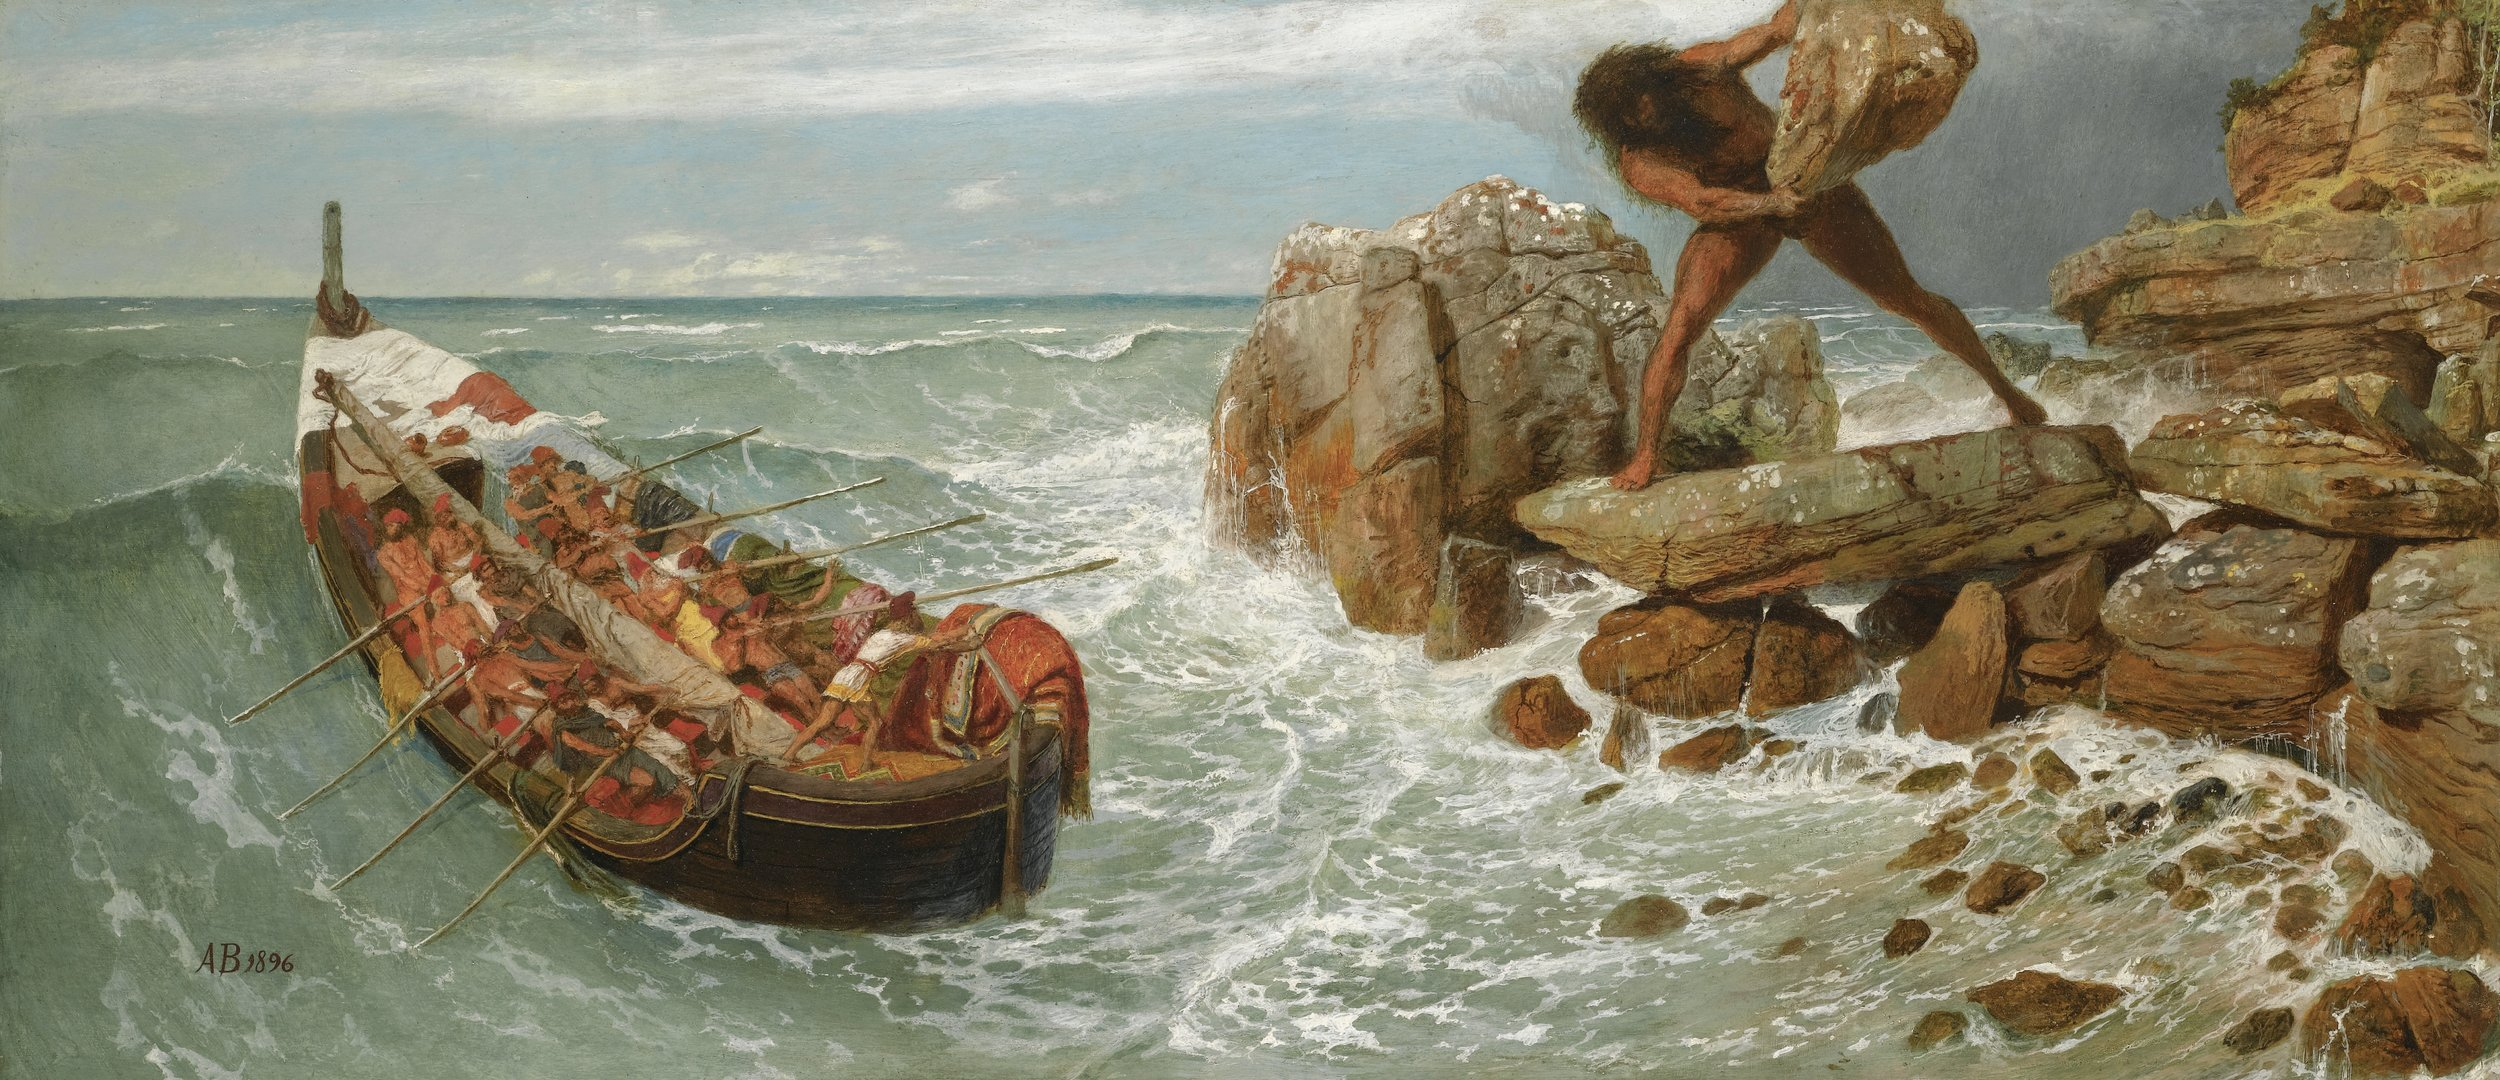 Arnold_Böcklin_-_Odysseus_and_Polyphemus.jpg